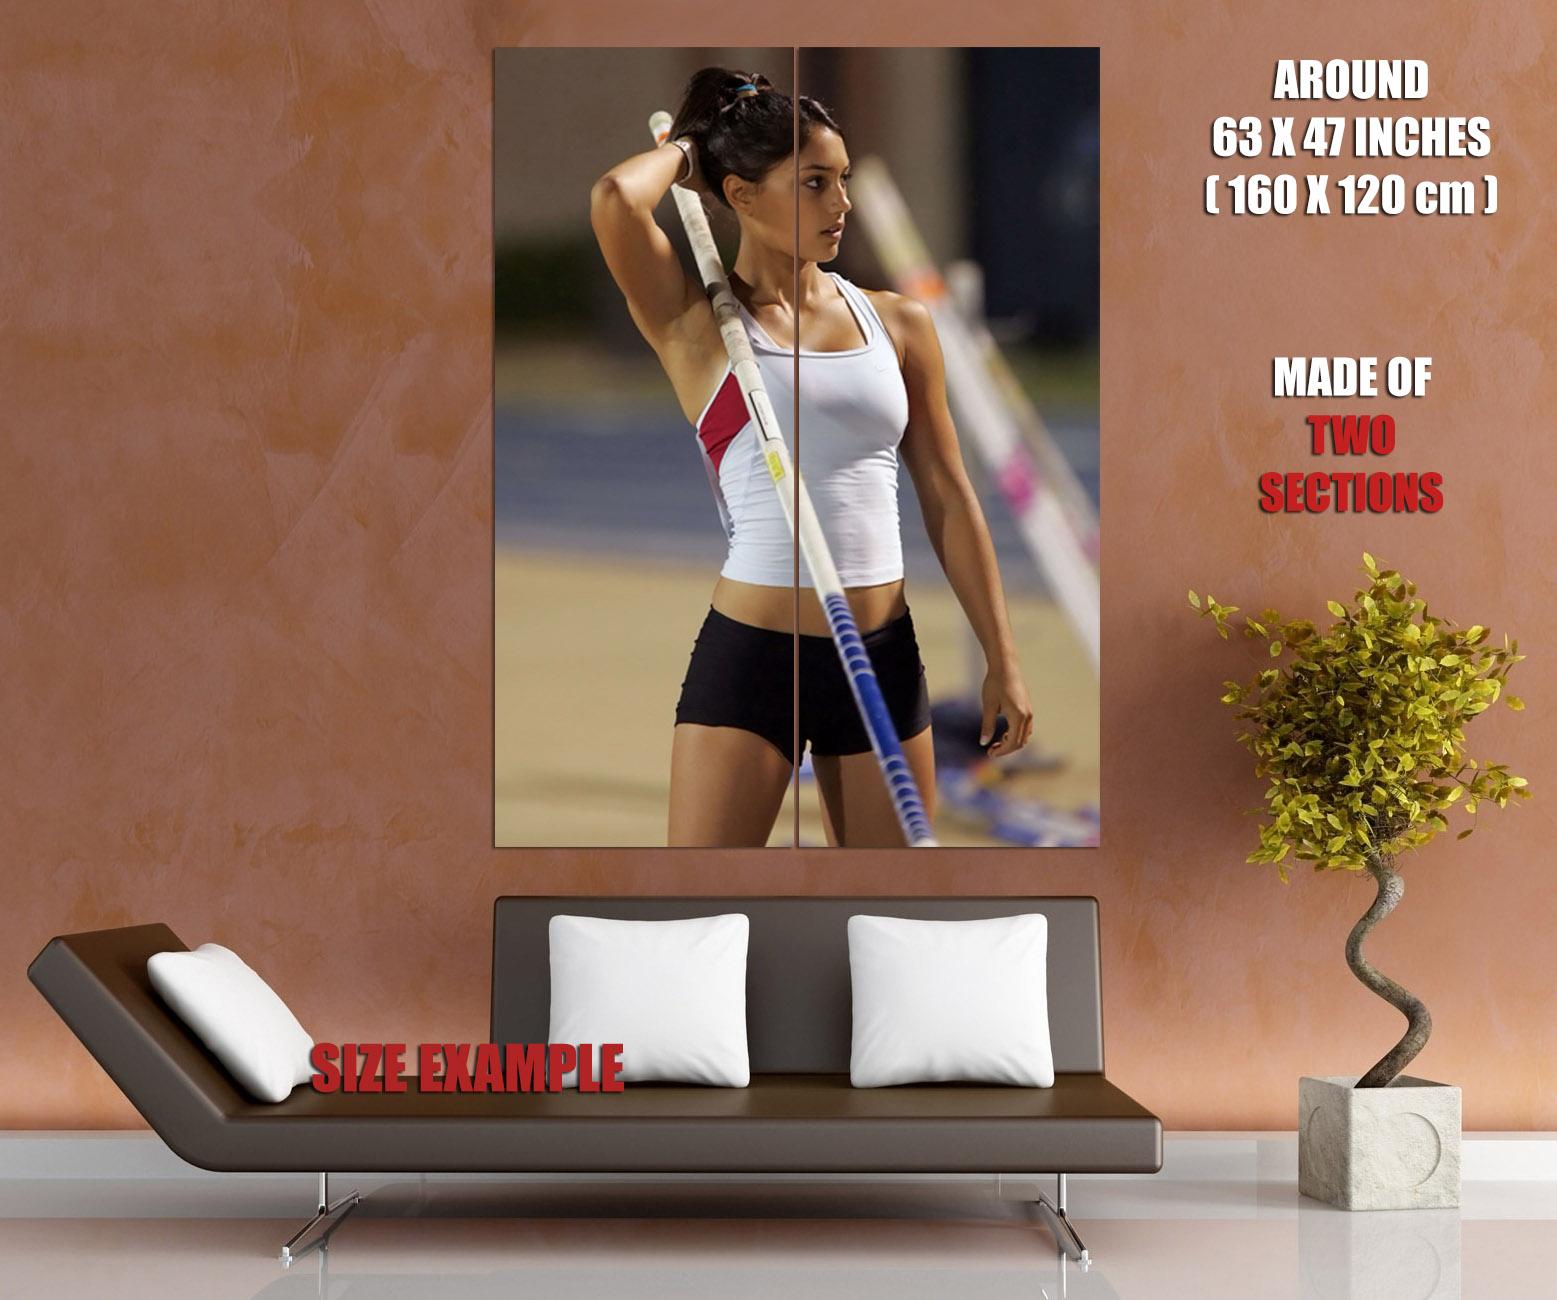 C4923-Allison-Stokke-Hottest-Pole-vaulter-Wall-Print-POSTER-AU